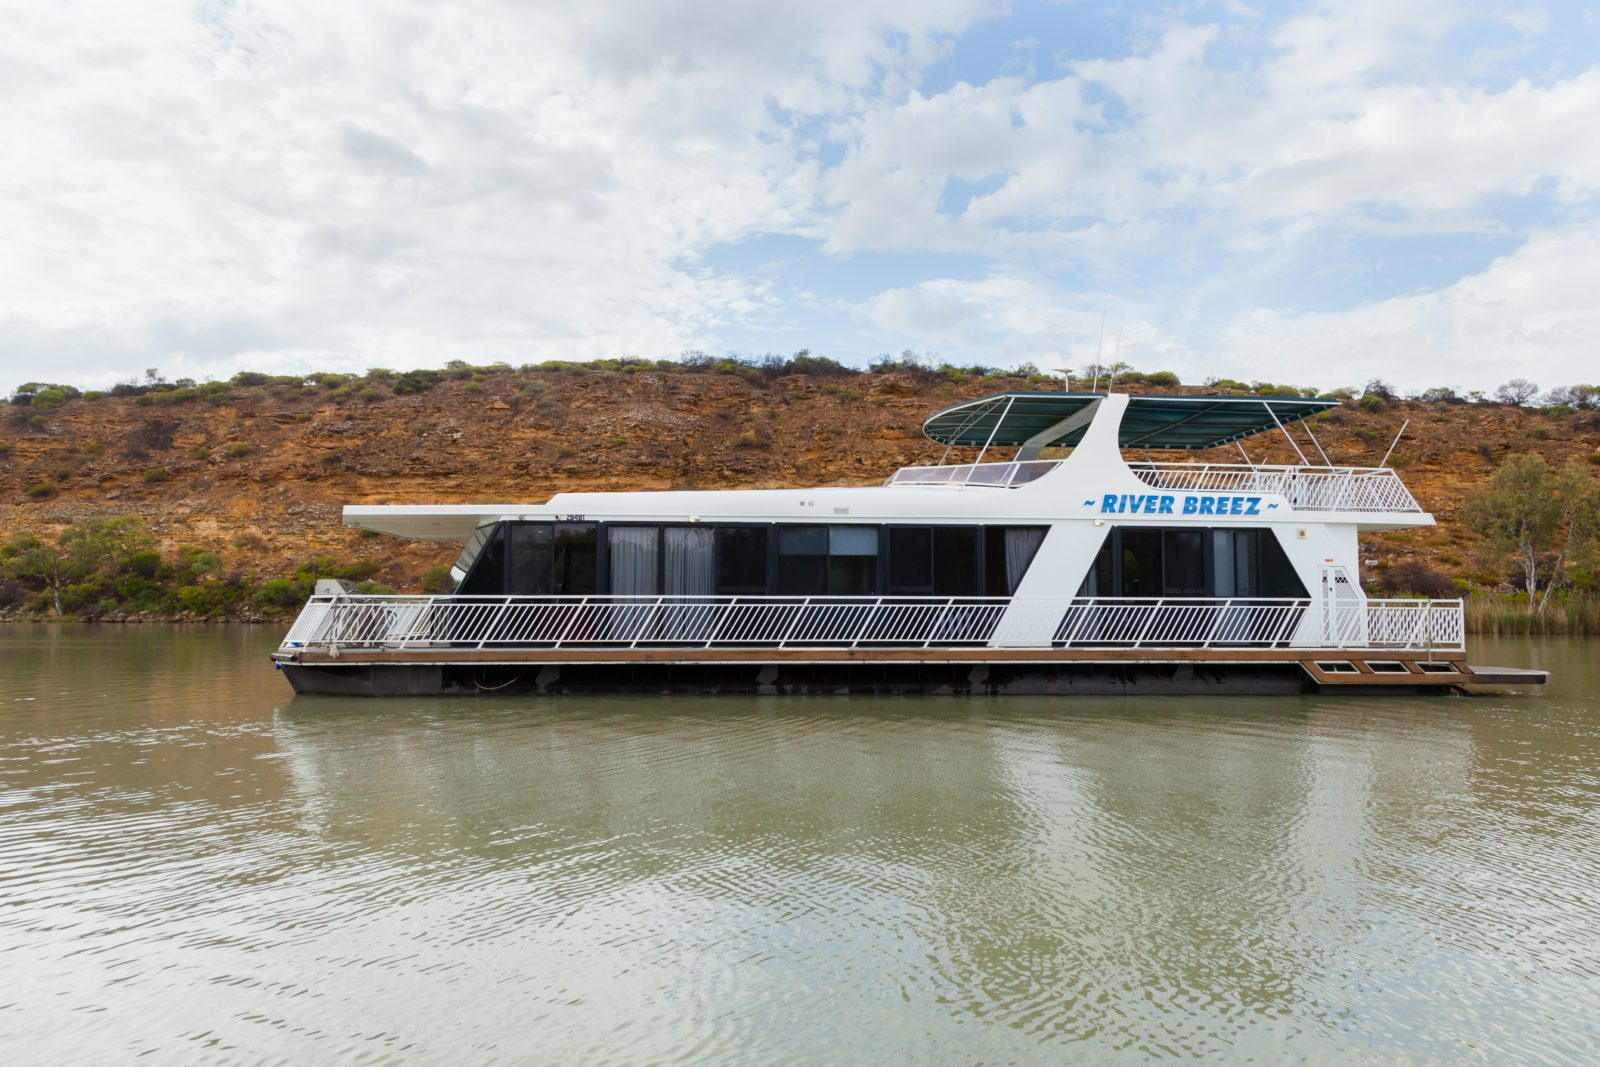 River Breez Houseboats